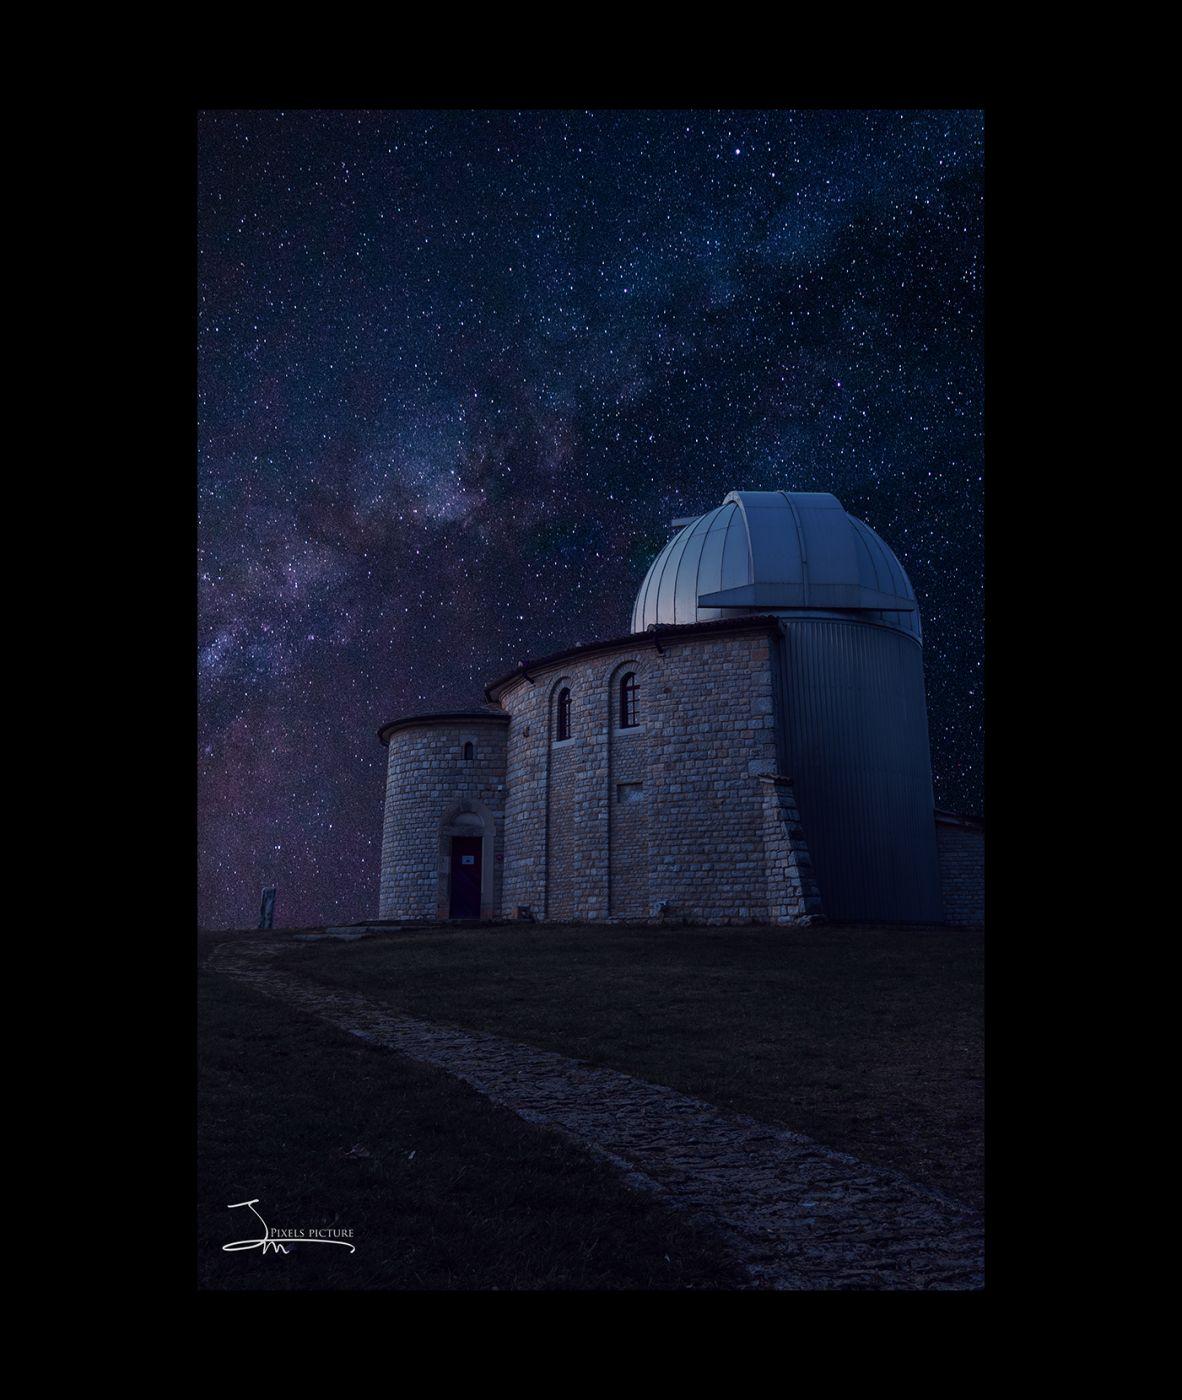 Observatory Višnjan / Croatia, Croatia